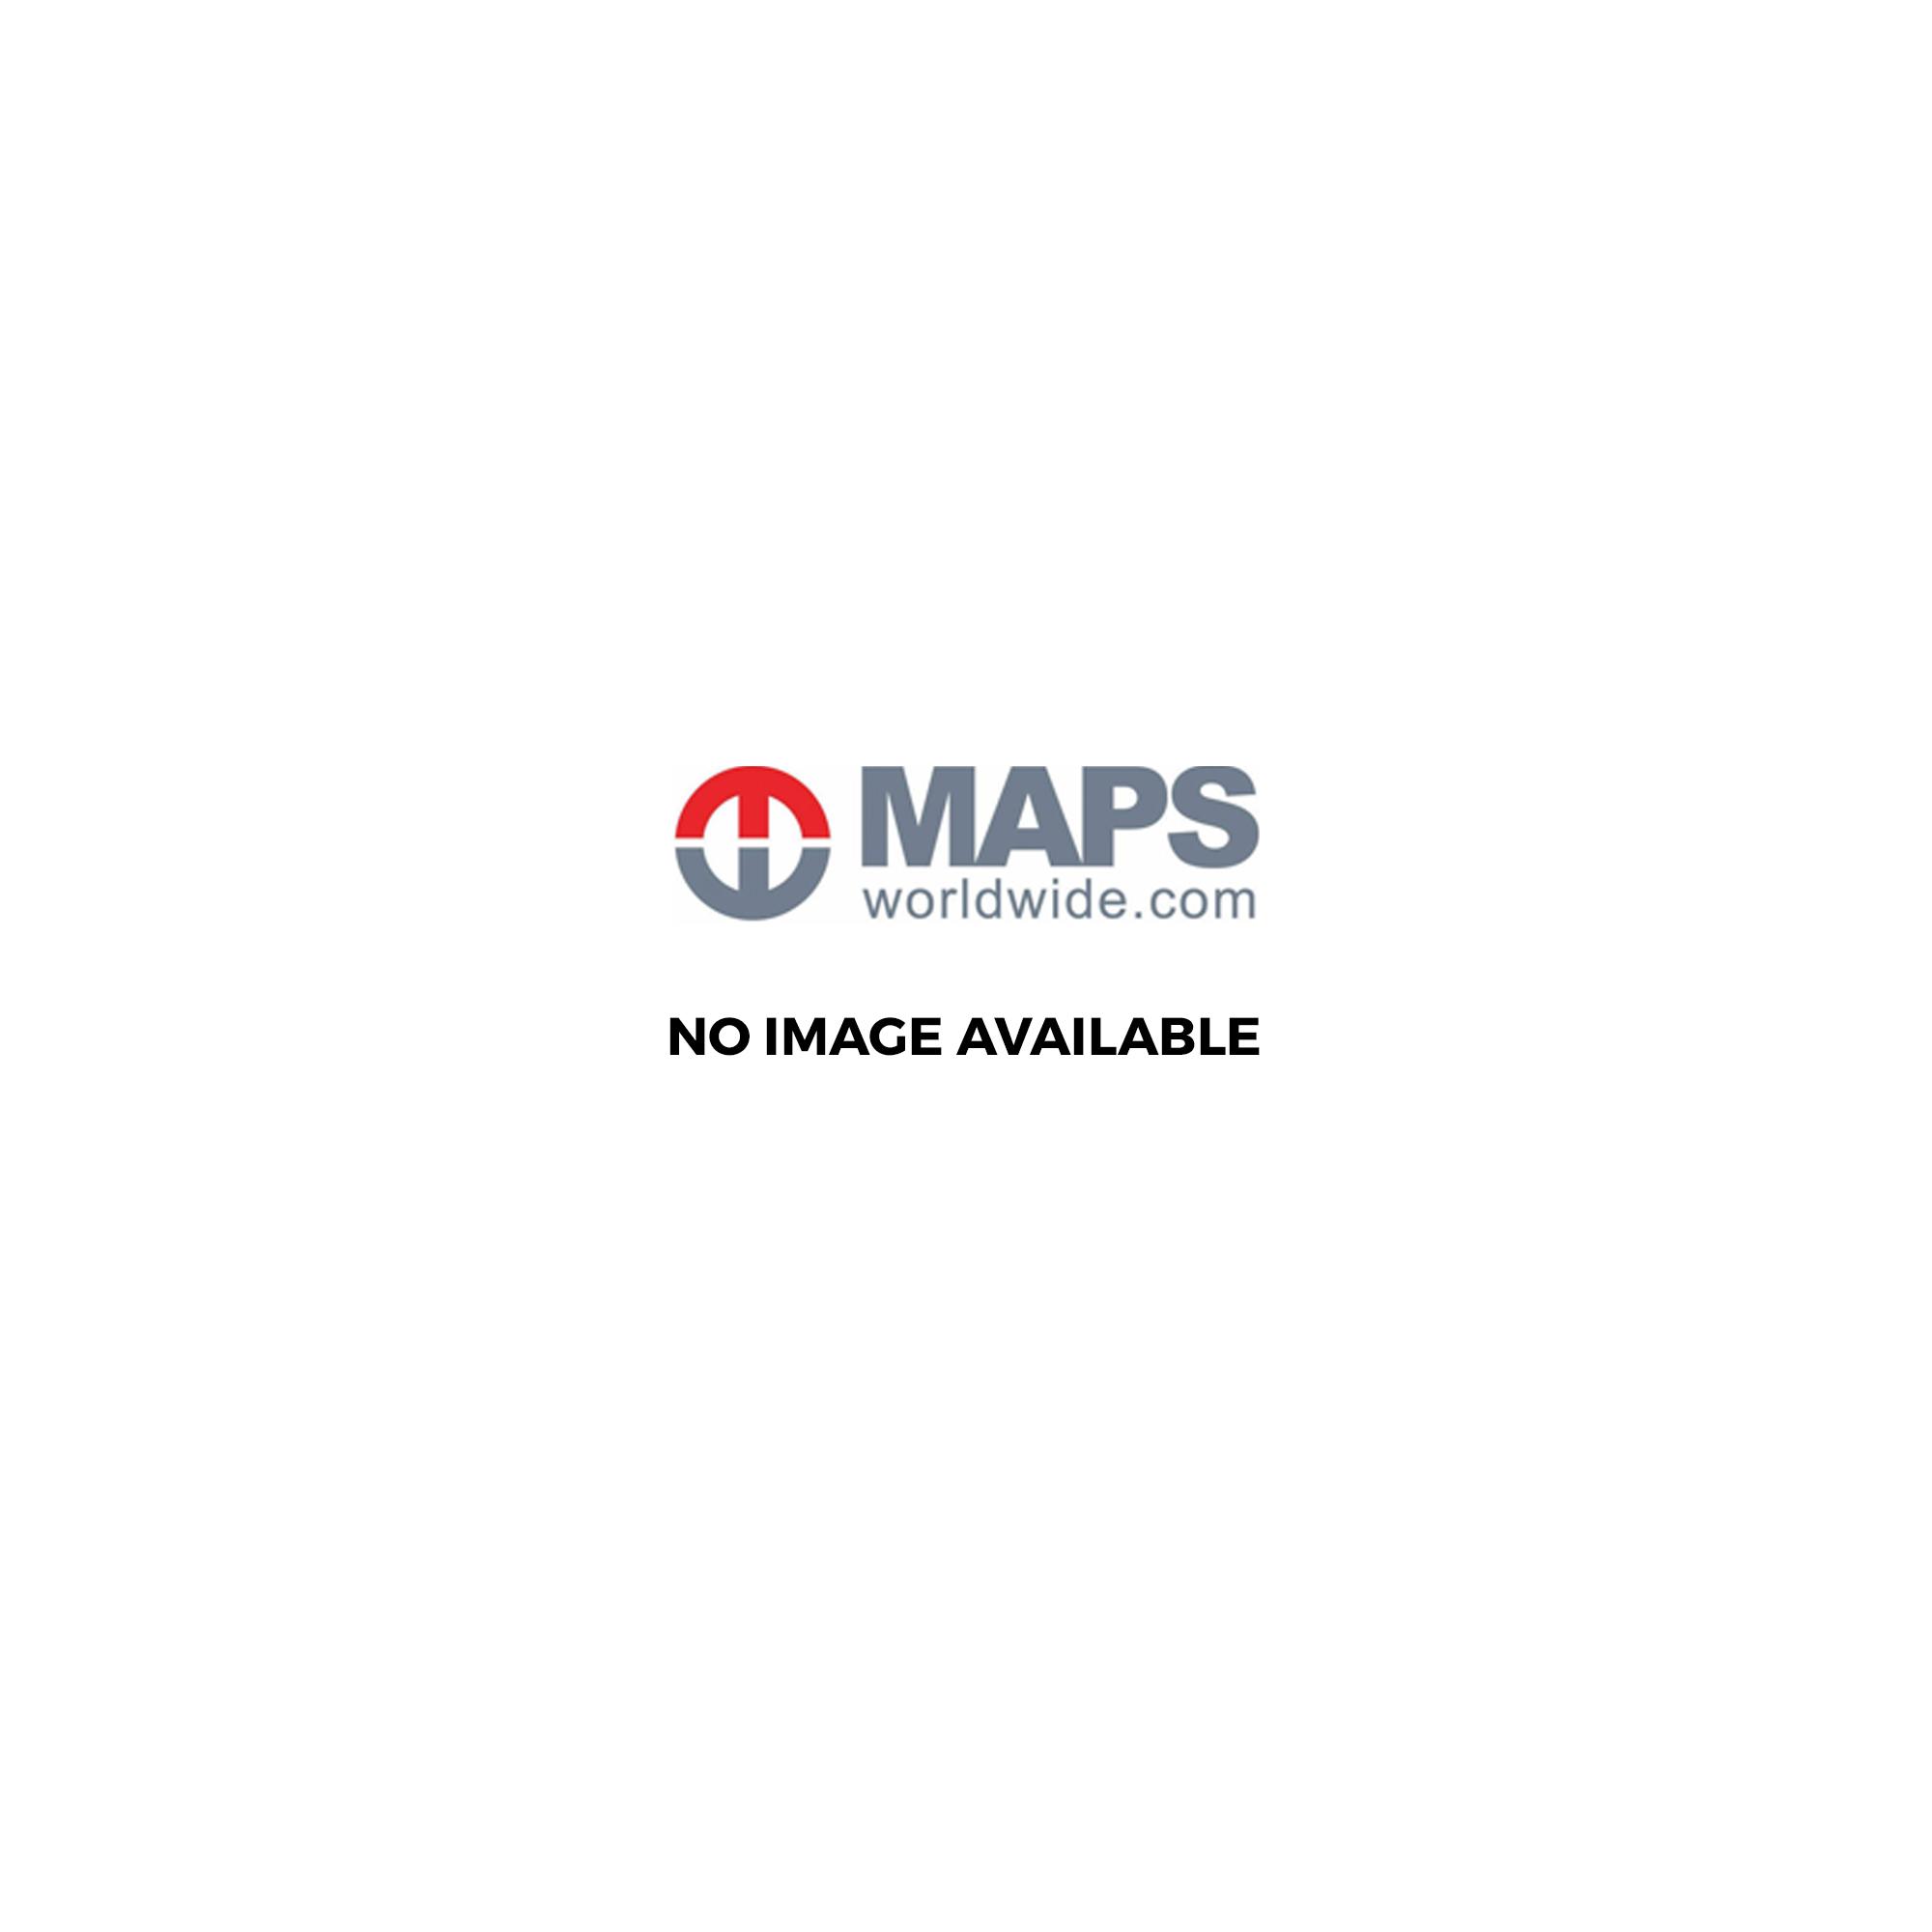 nordeca kart Trogstad Tourist Map: 2747   Europe from Maps Worldwide UK nordeca kart